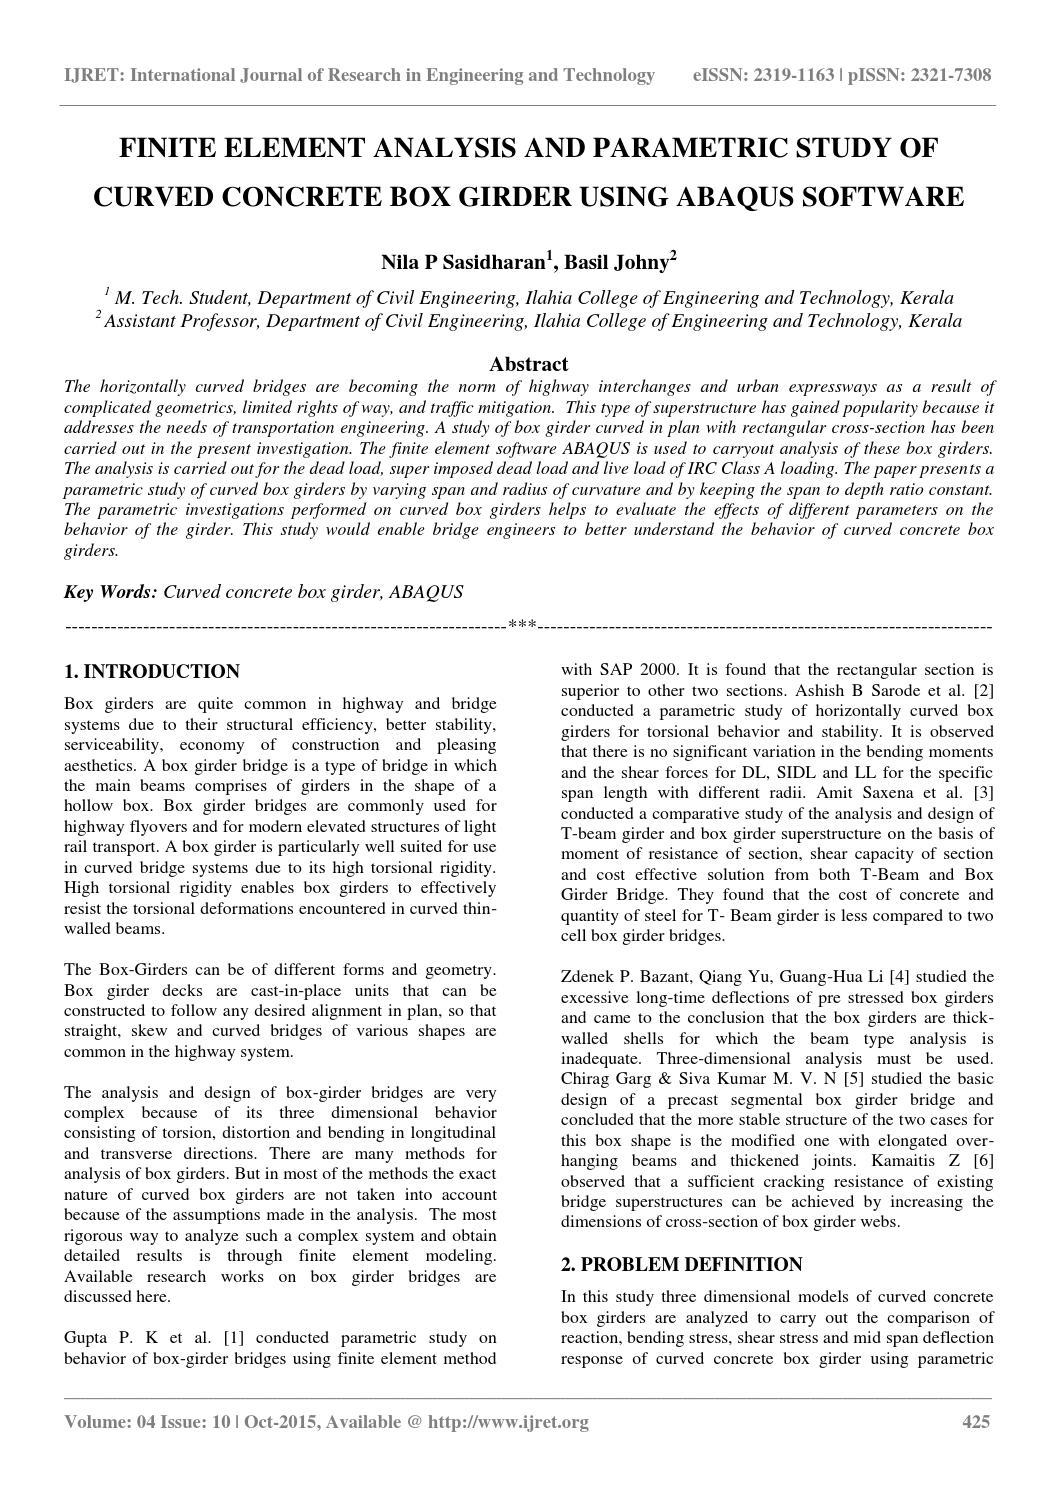 Parametric model in ABAQUS | iMechanica